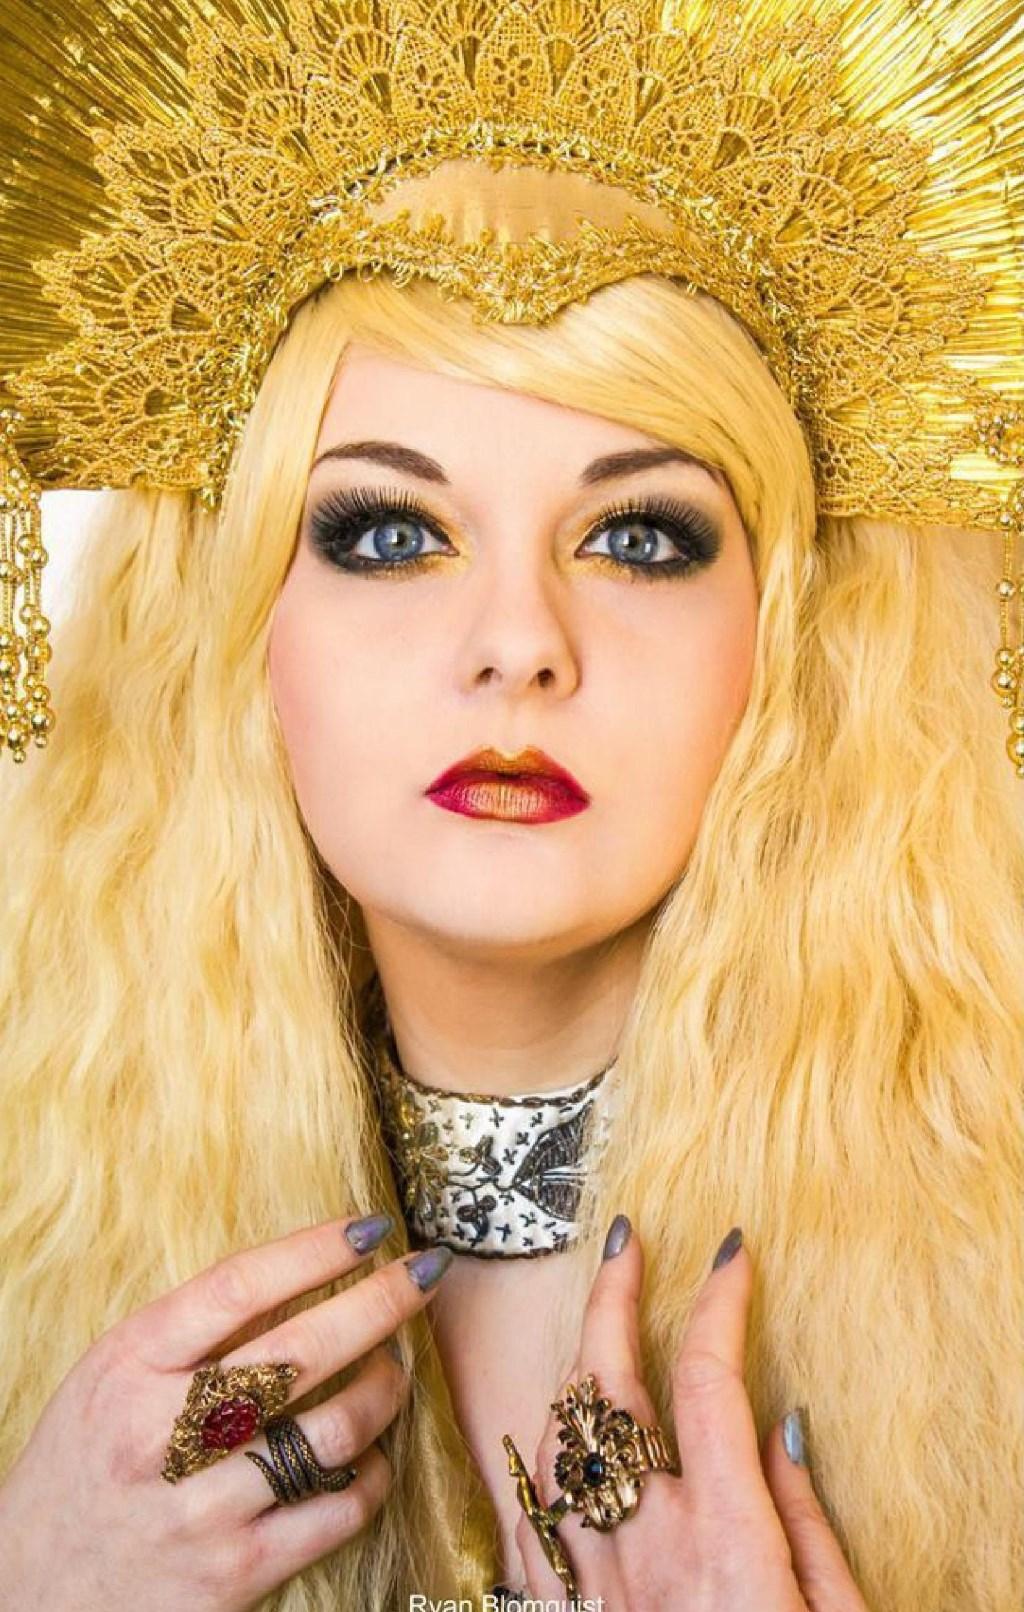 The Pfister® Hotel Names Stephanie Schultz as Next Artist In Residence